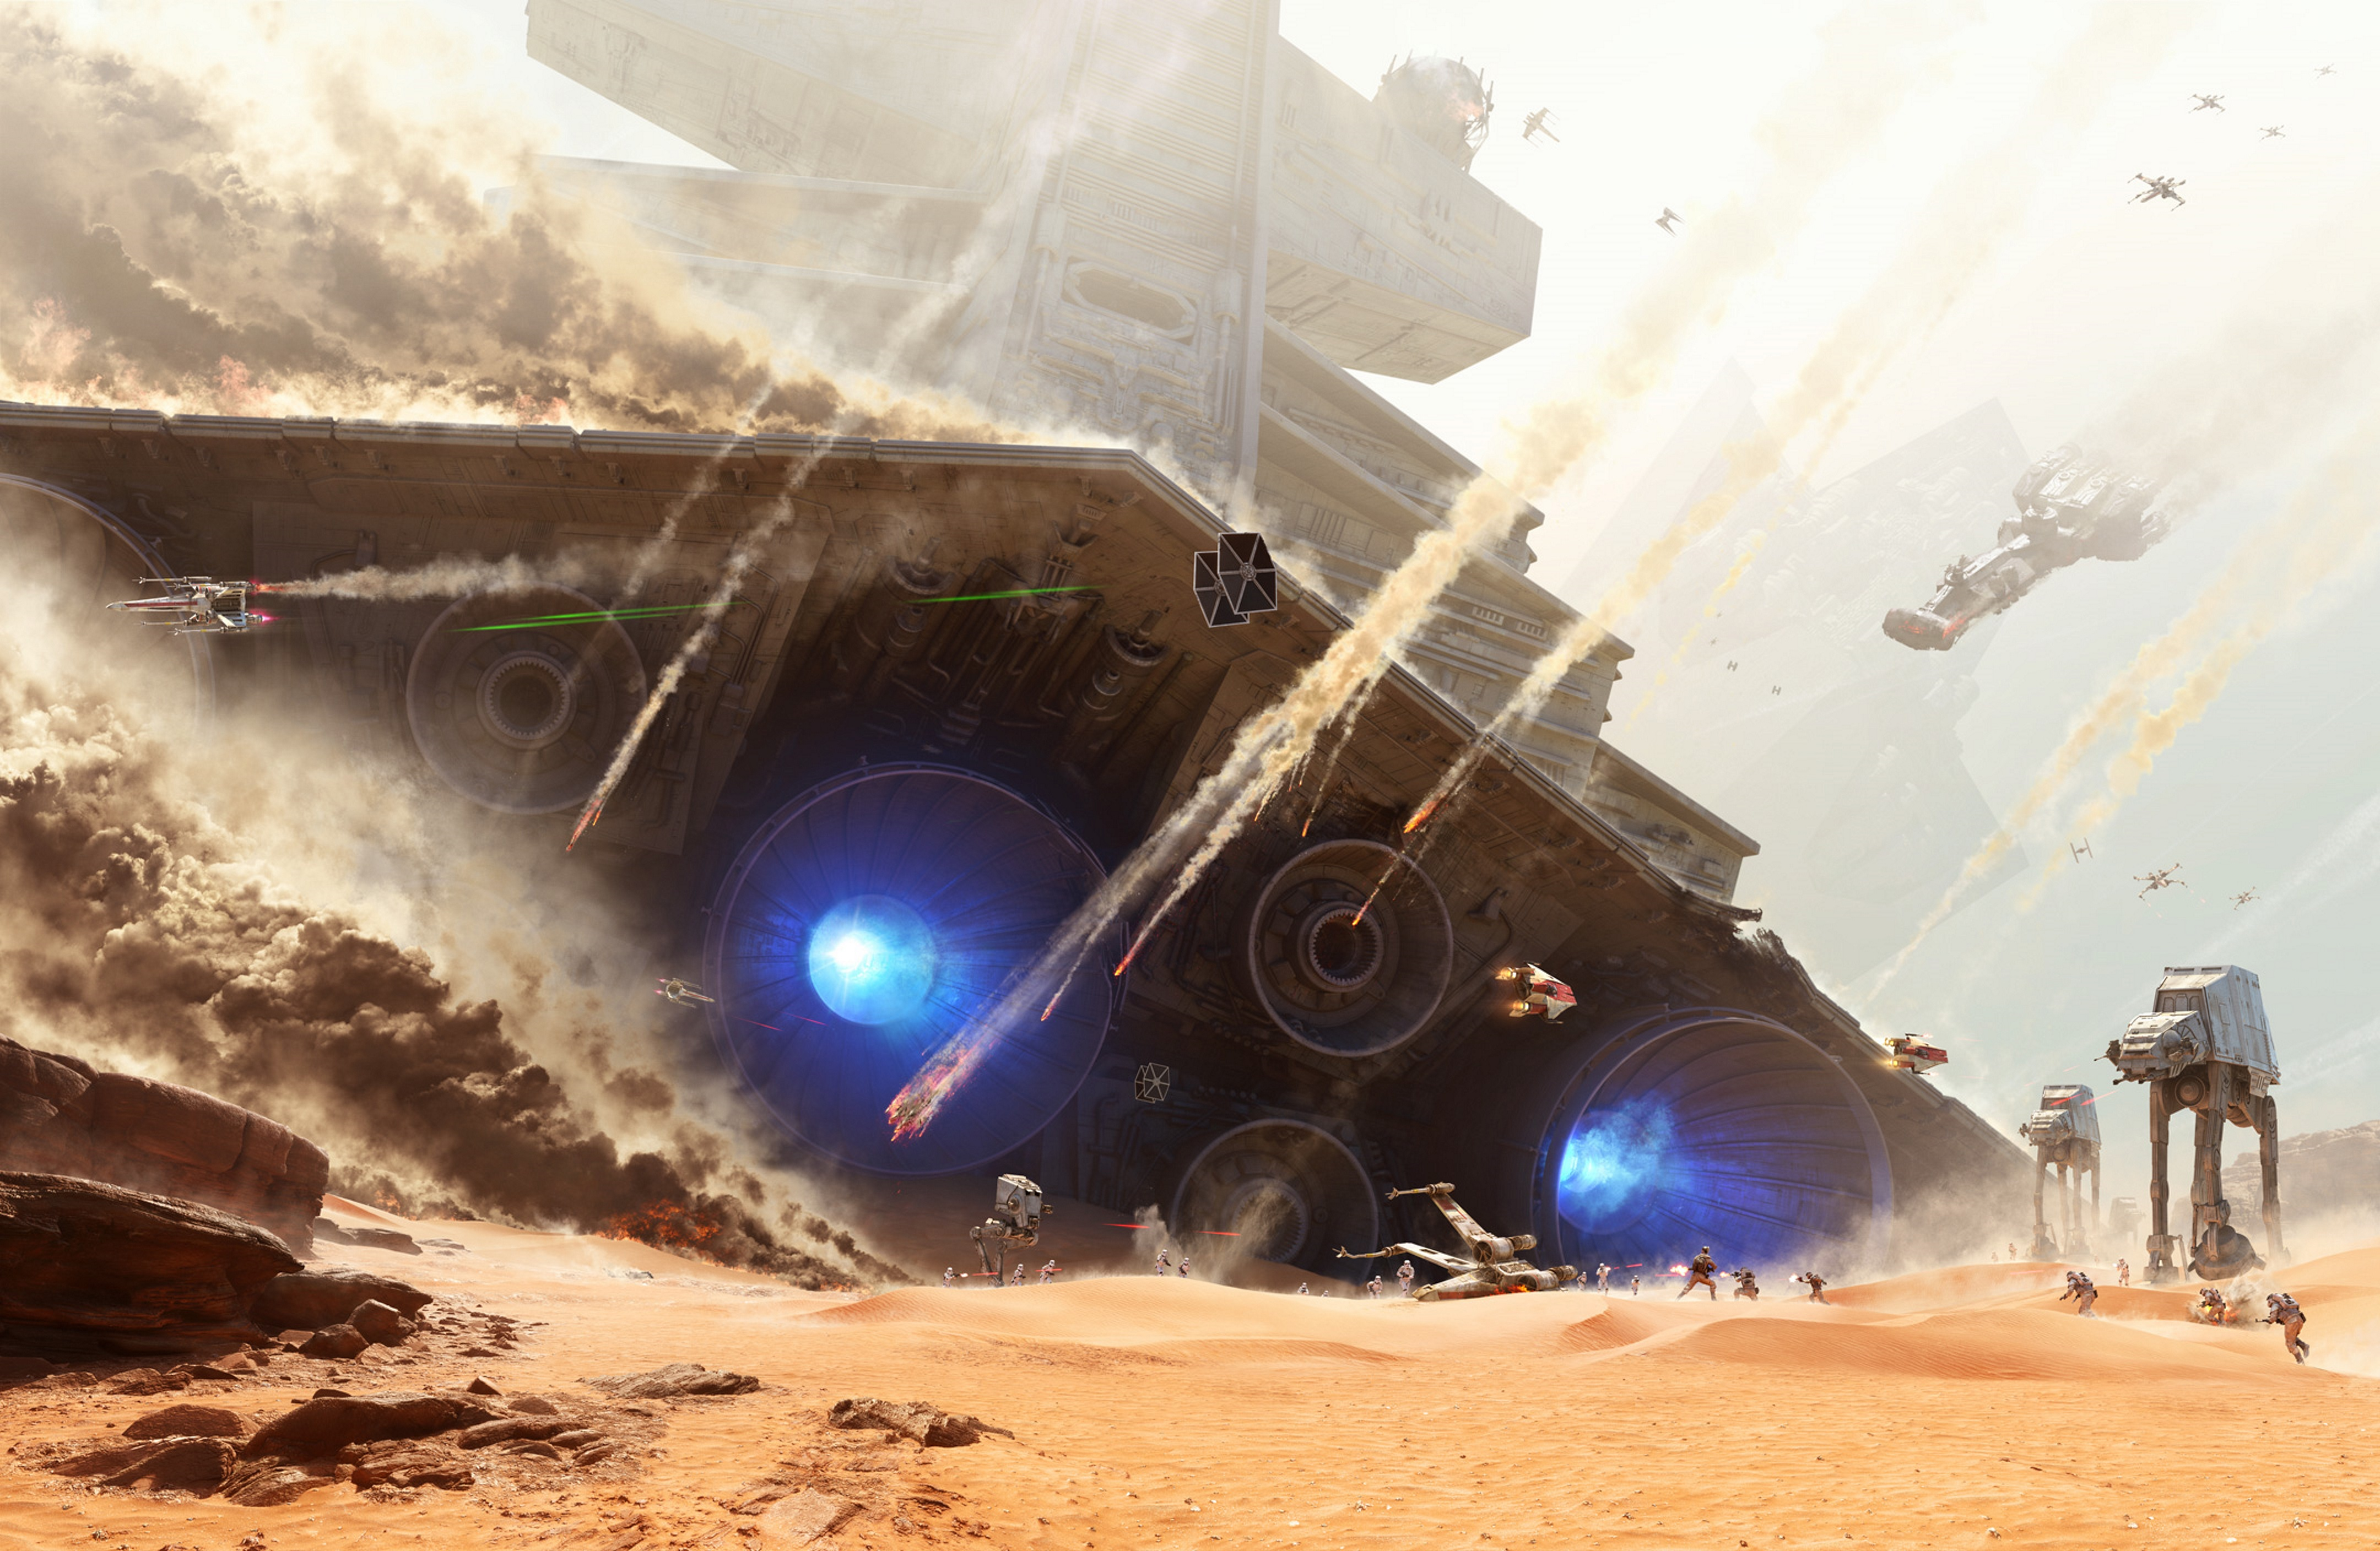 Star Wars Battlefront   Battle of Jakku [Hi Res Textless Wallpaper 4320x2816